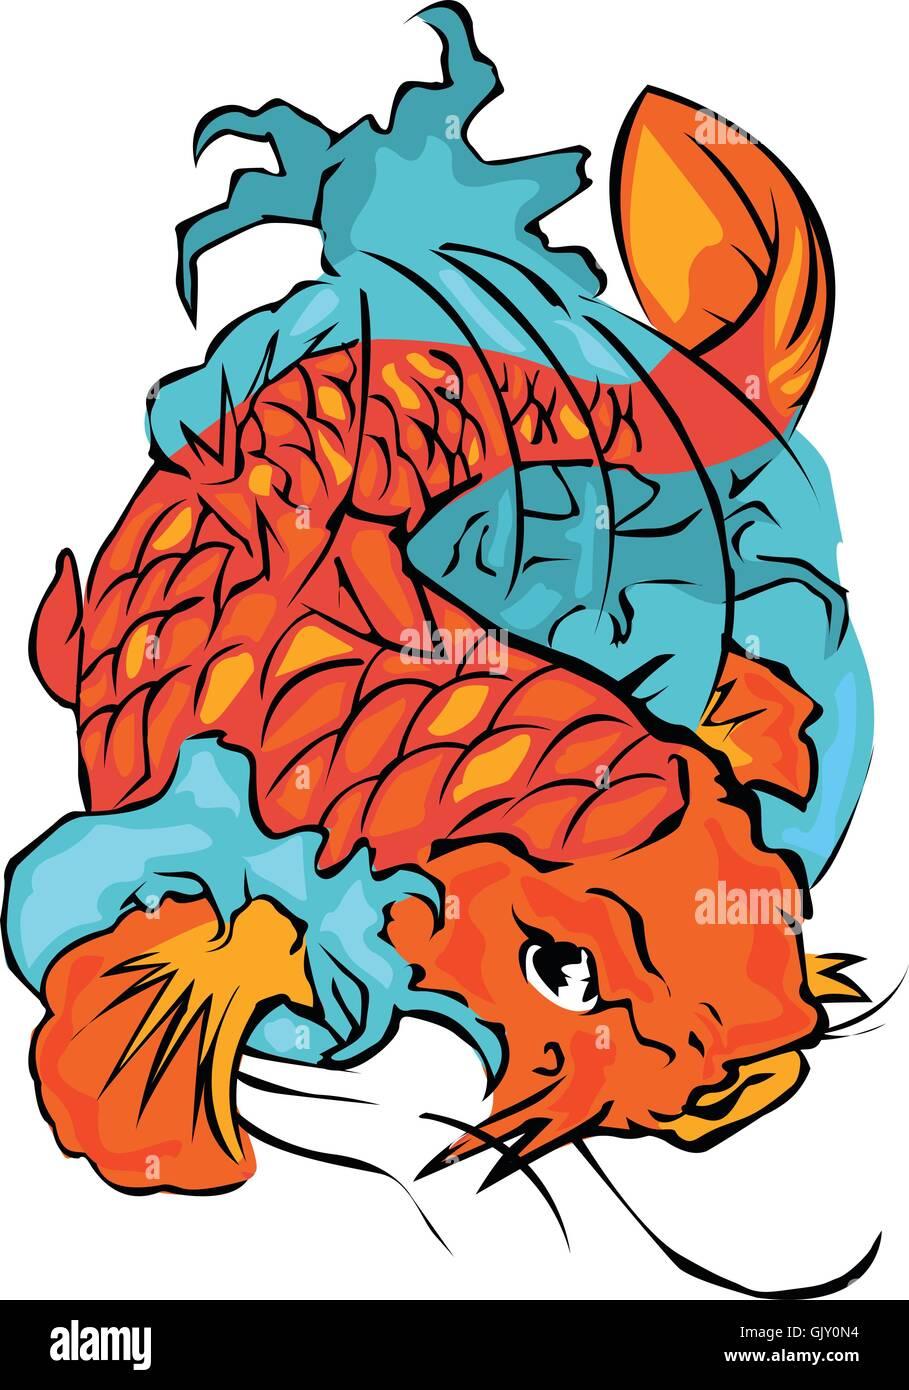 Koi Carp Tattoo Stock Photos & Koi Carp Tattoo Stock Images - Alamy